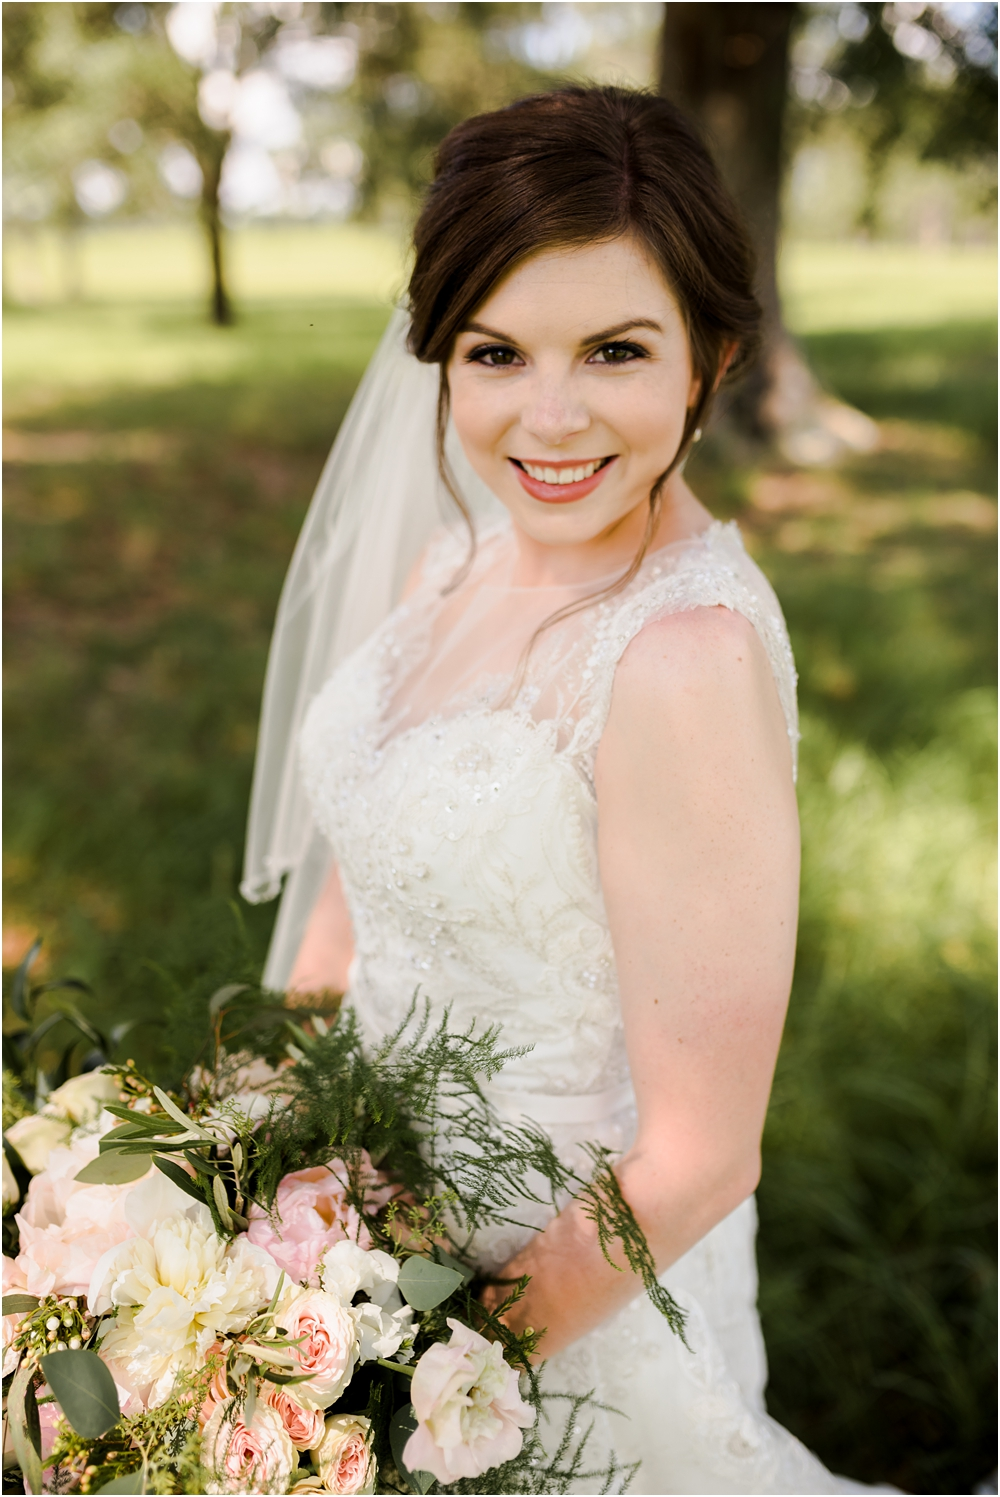 marianna-florida-wedding-photographer-kiersten-grant-43.jpg